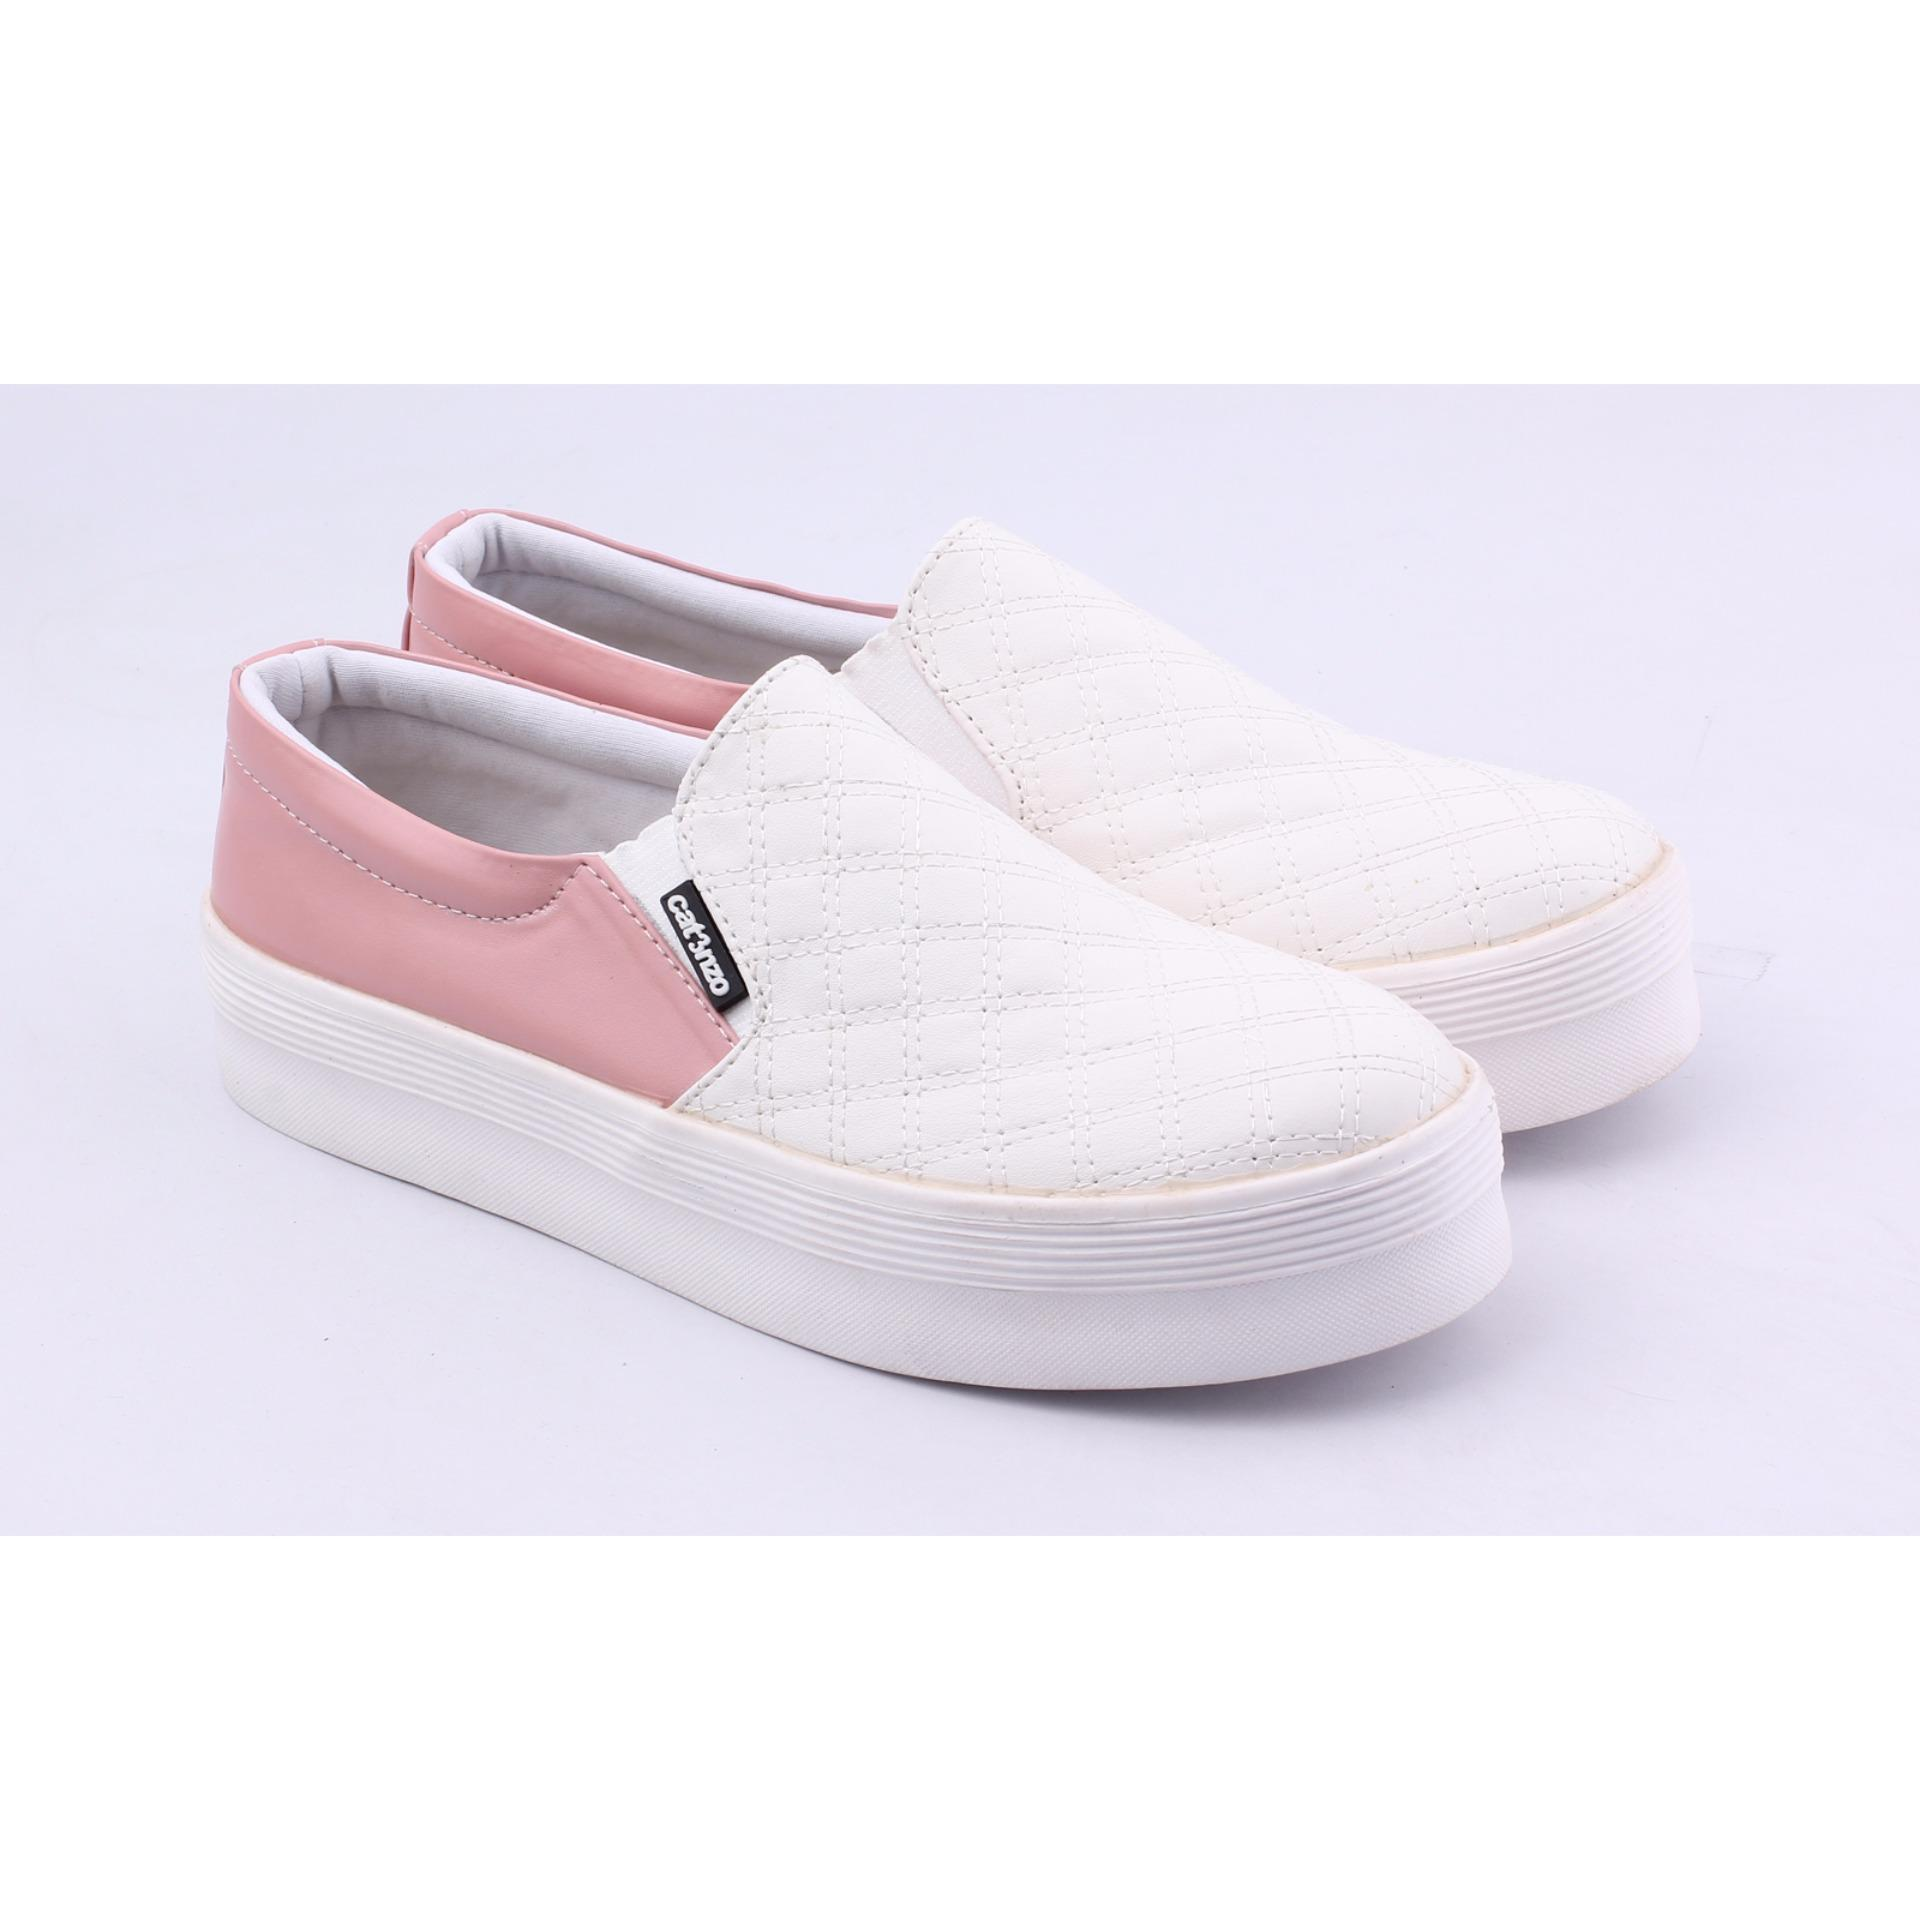 Cek Harga Baru Sepatu Sneakers Kets Wanita Catenzo Dh 060 White Pink ... 9a5b1abf33